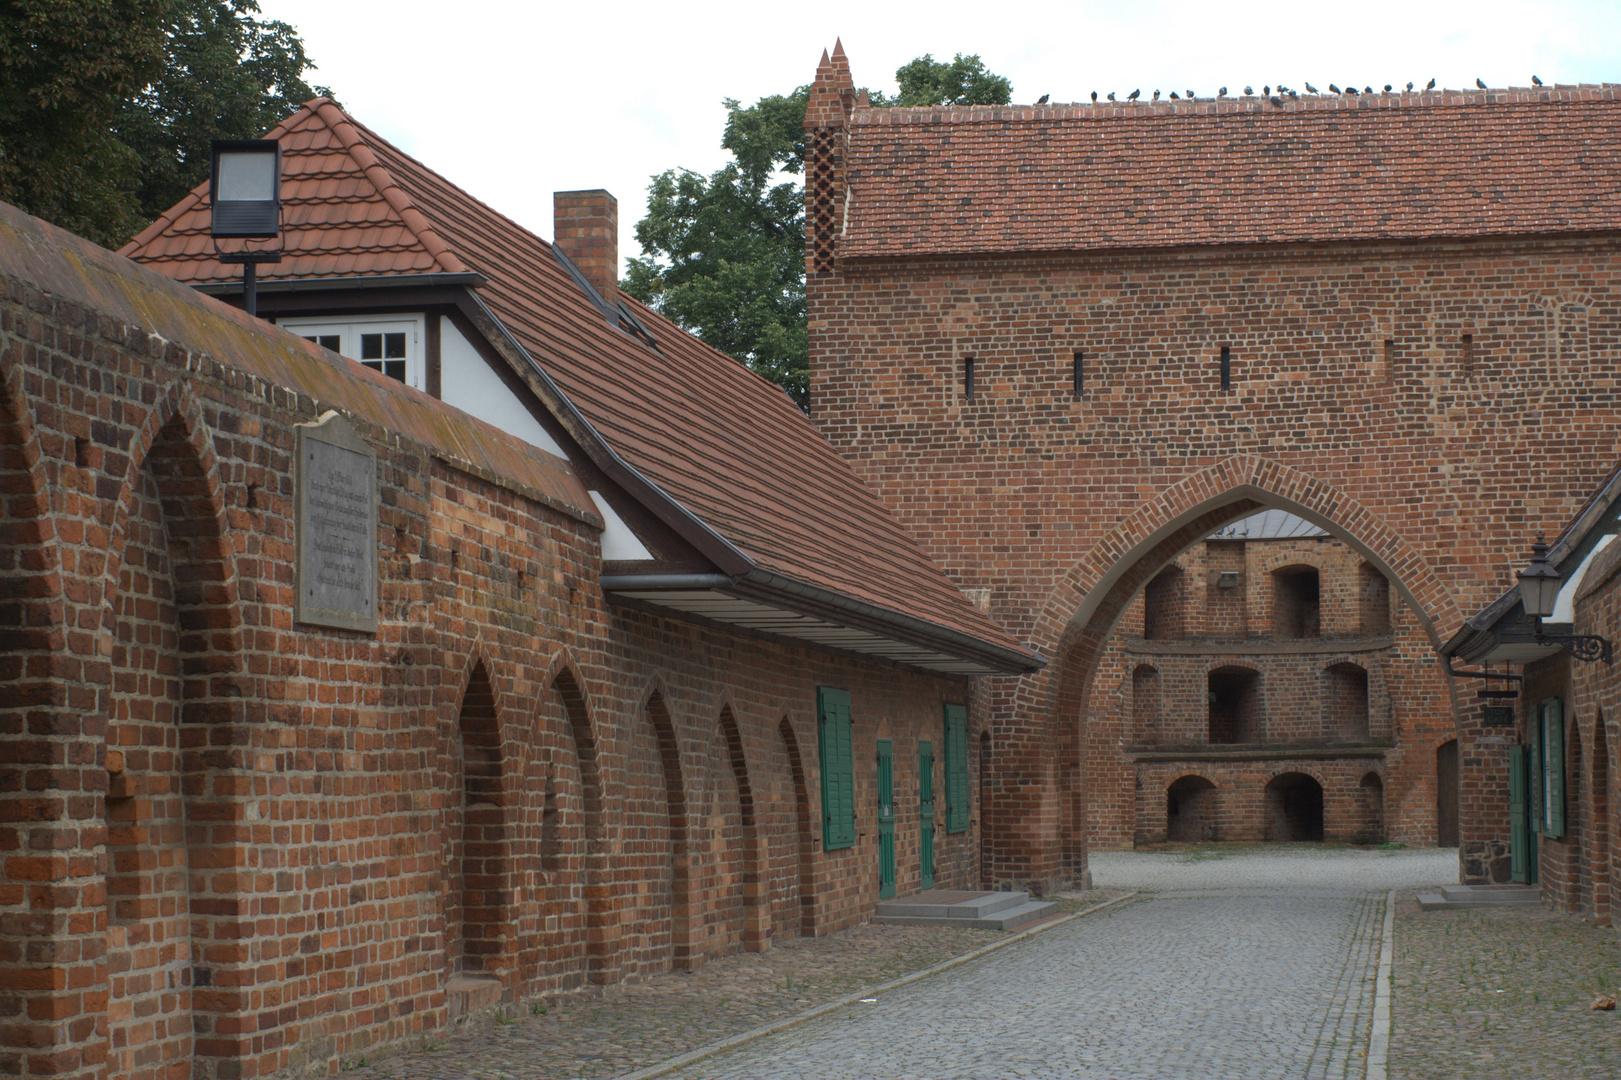 am Friedländer Tor in Neubrandenburg